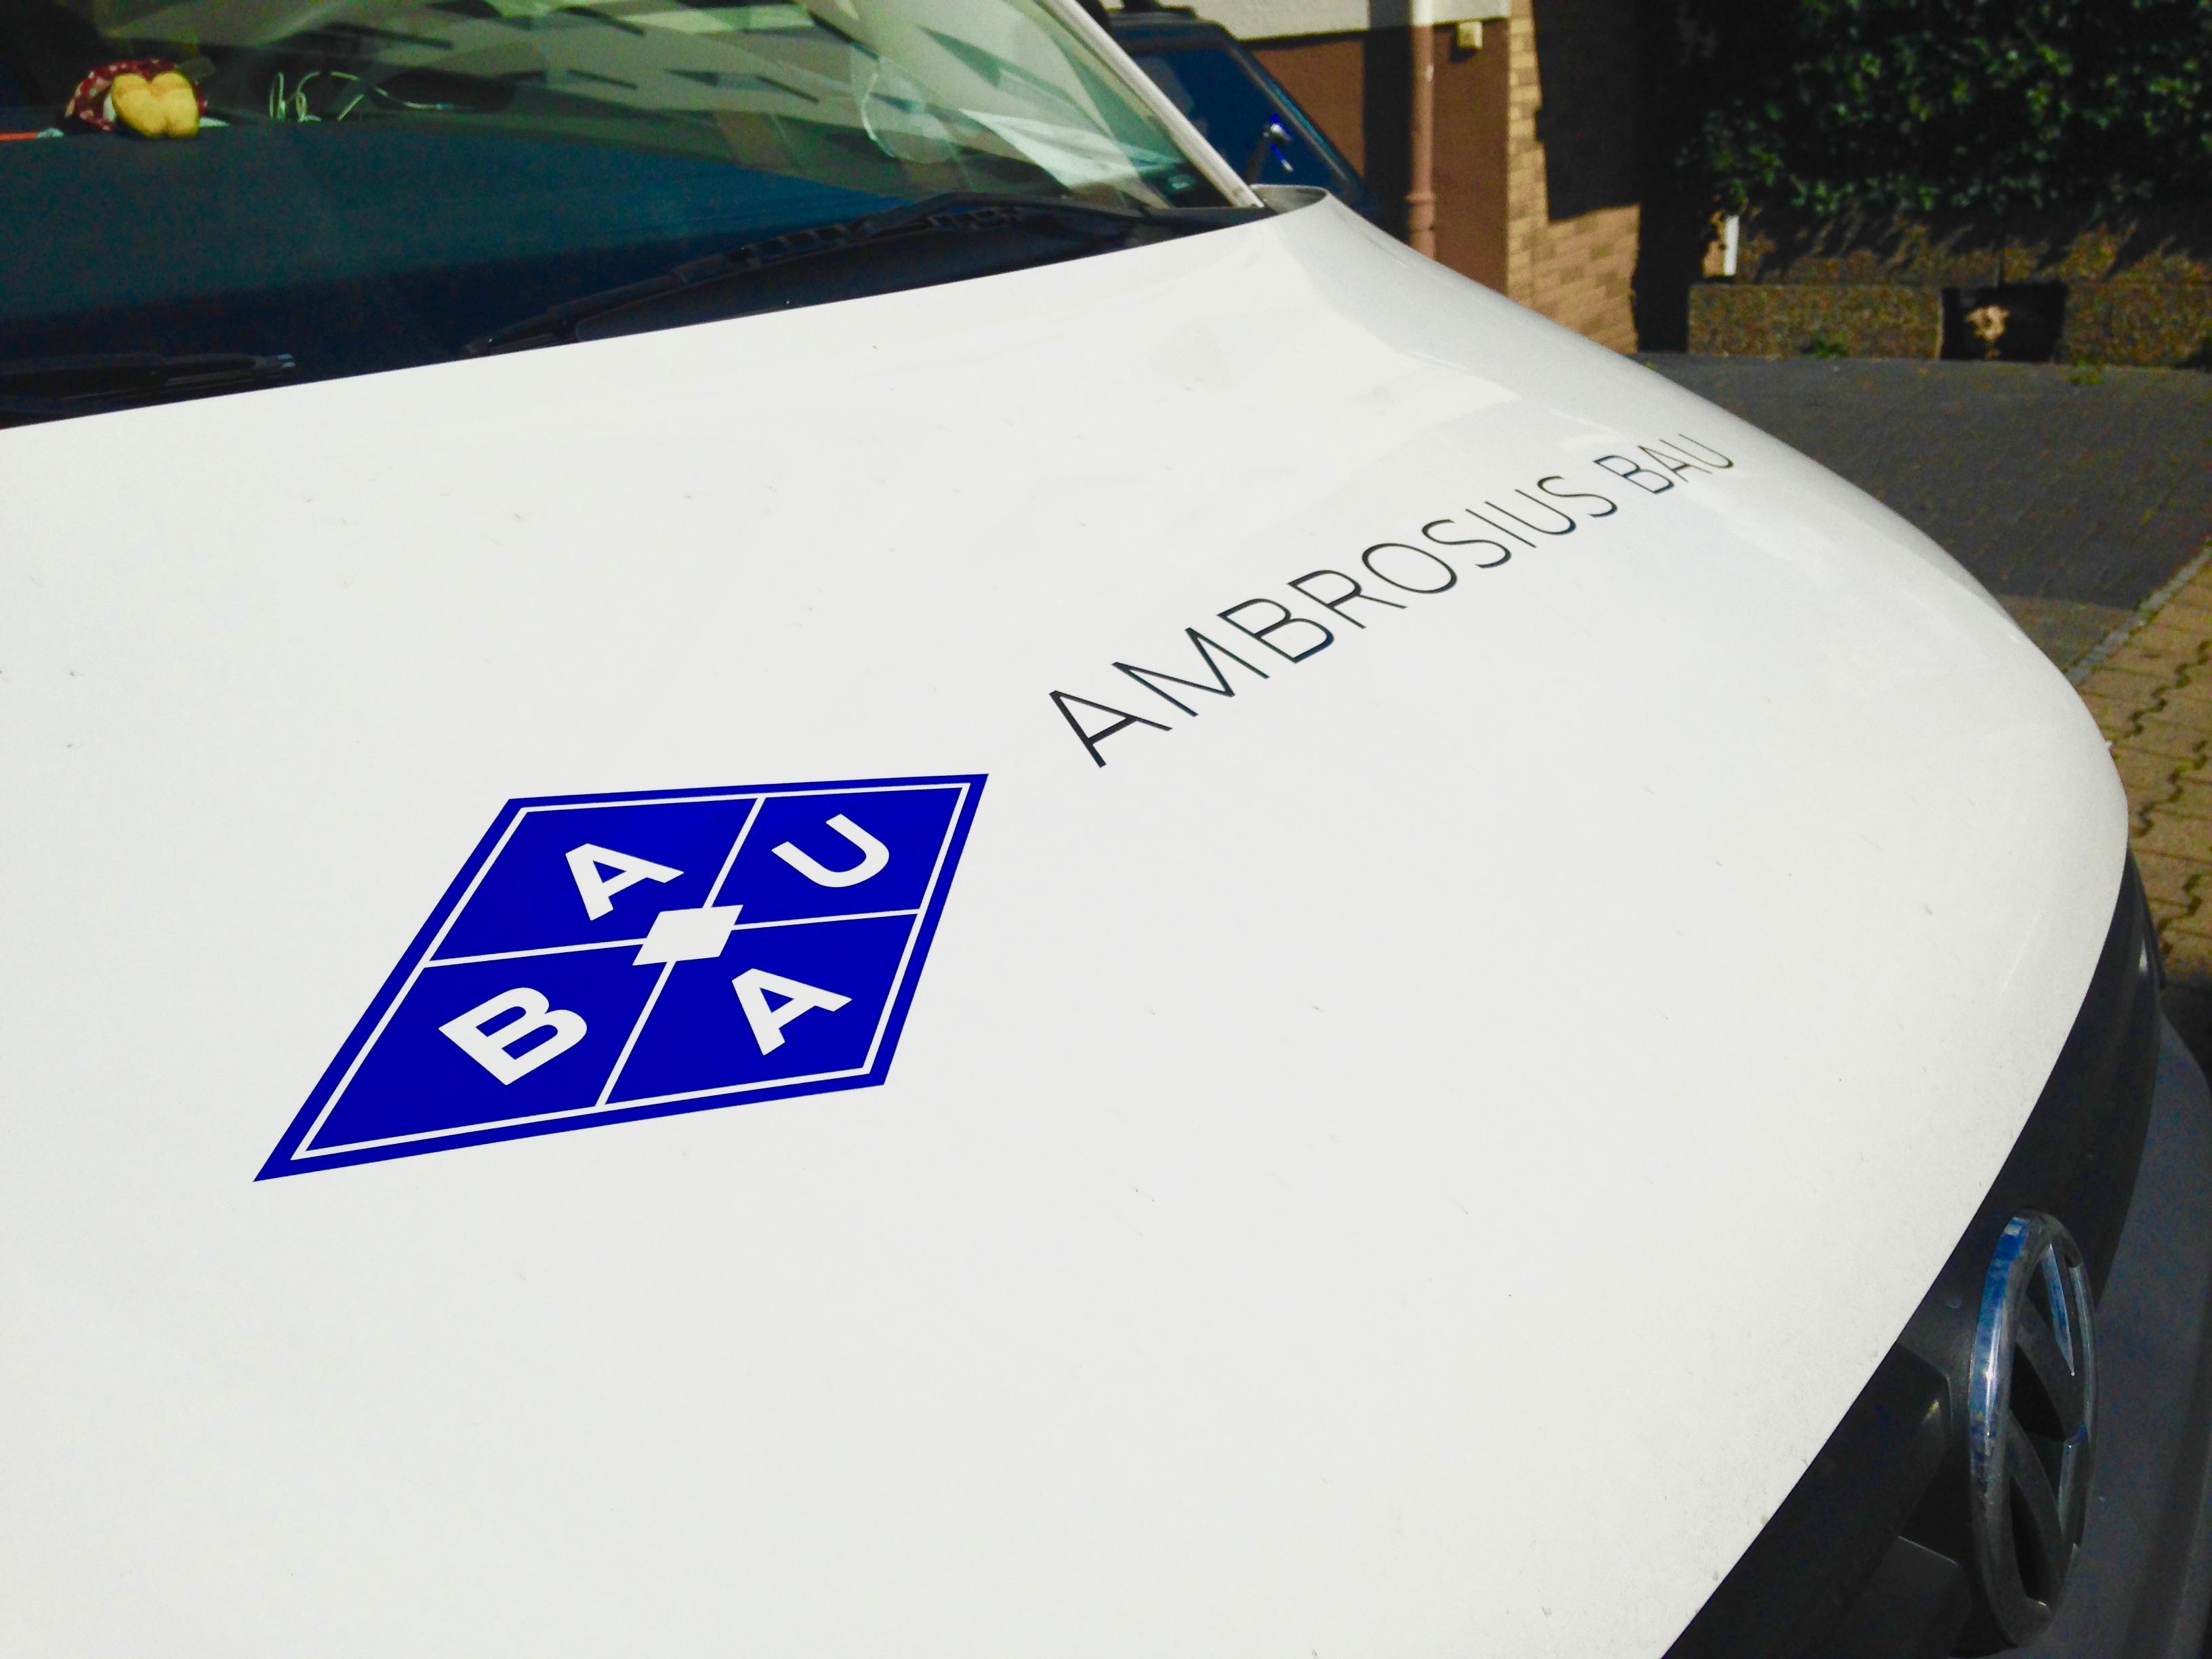 Baufirma Frankfurt ambrosius bau ihr bauunternehmen aus frankfurt am